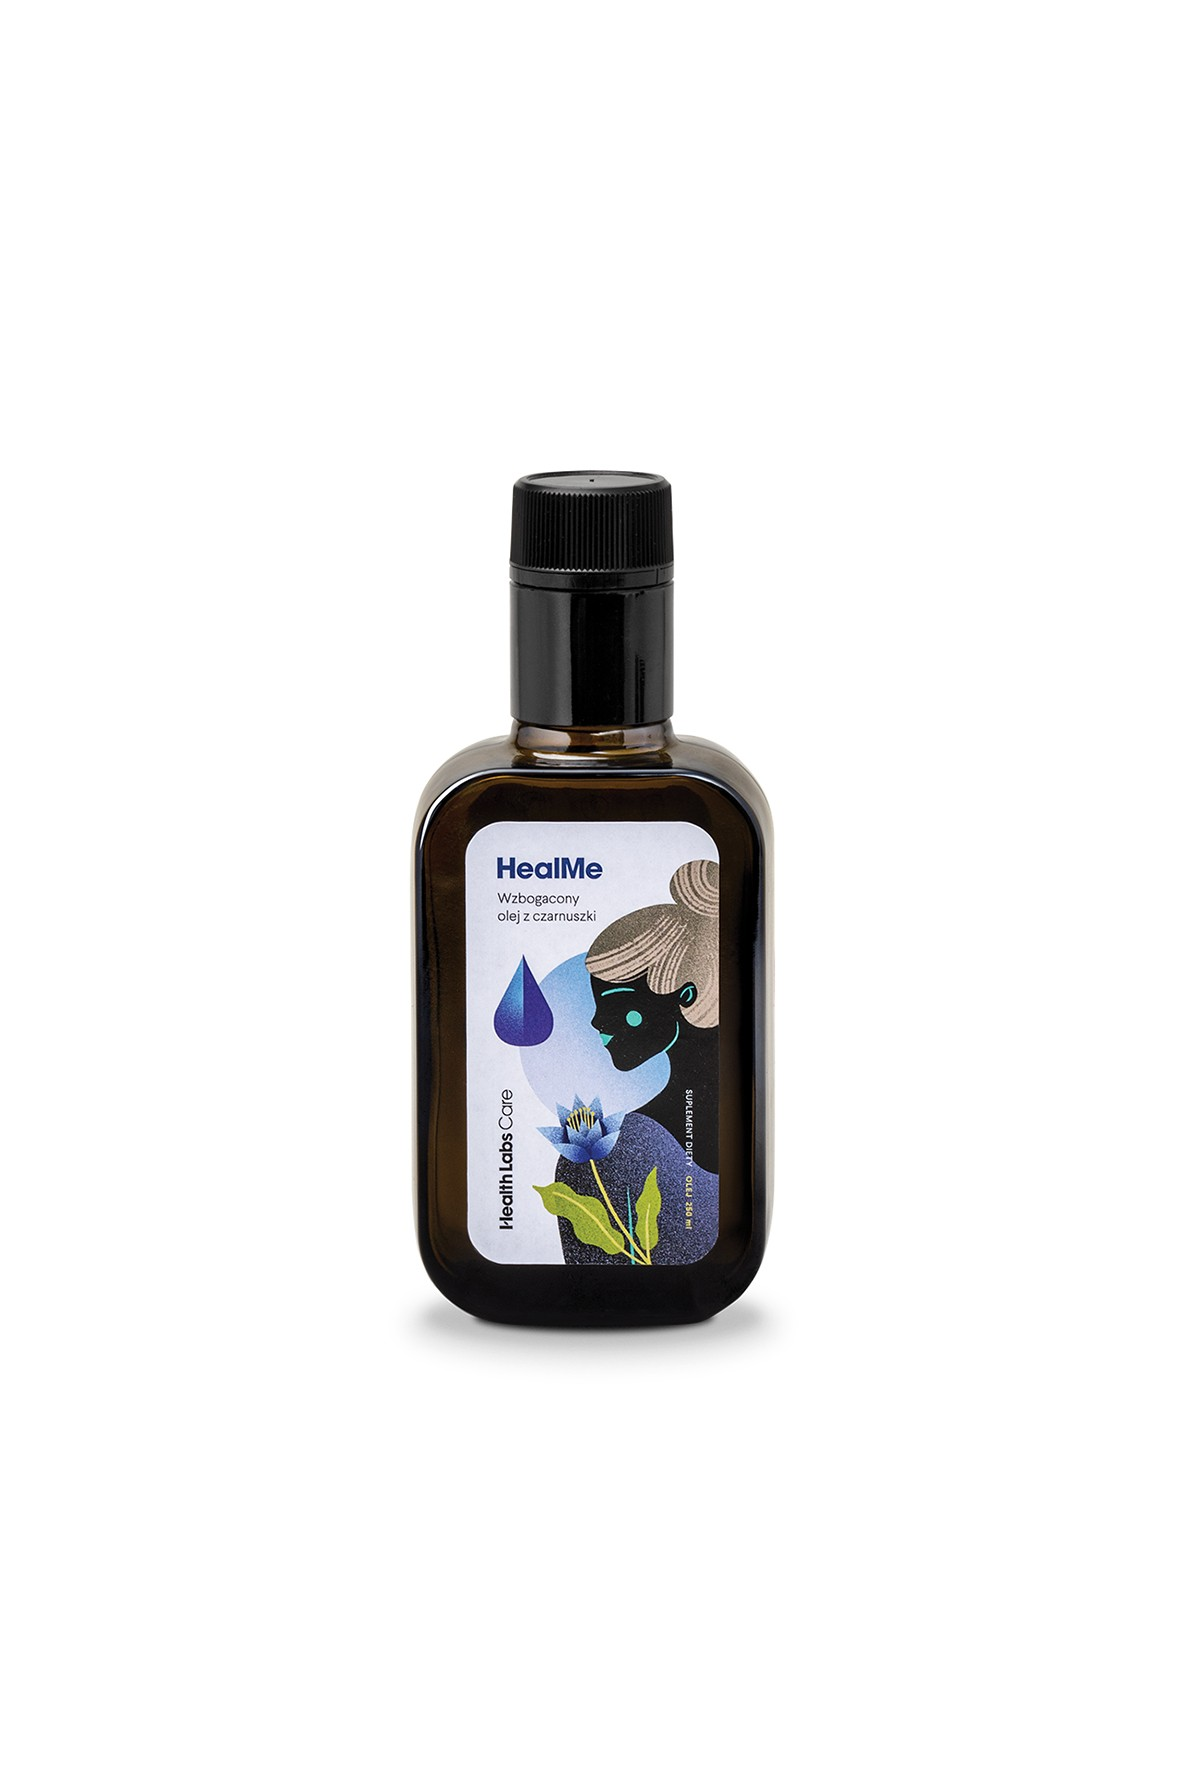 HealthLabs 4US HealMe - 250 ml